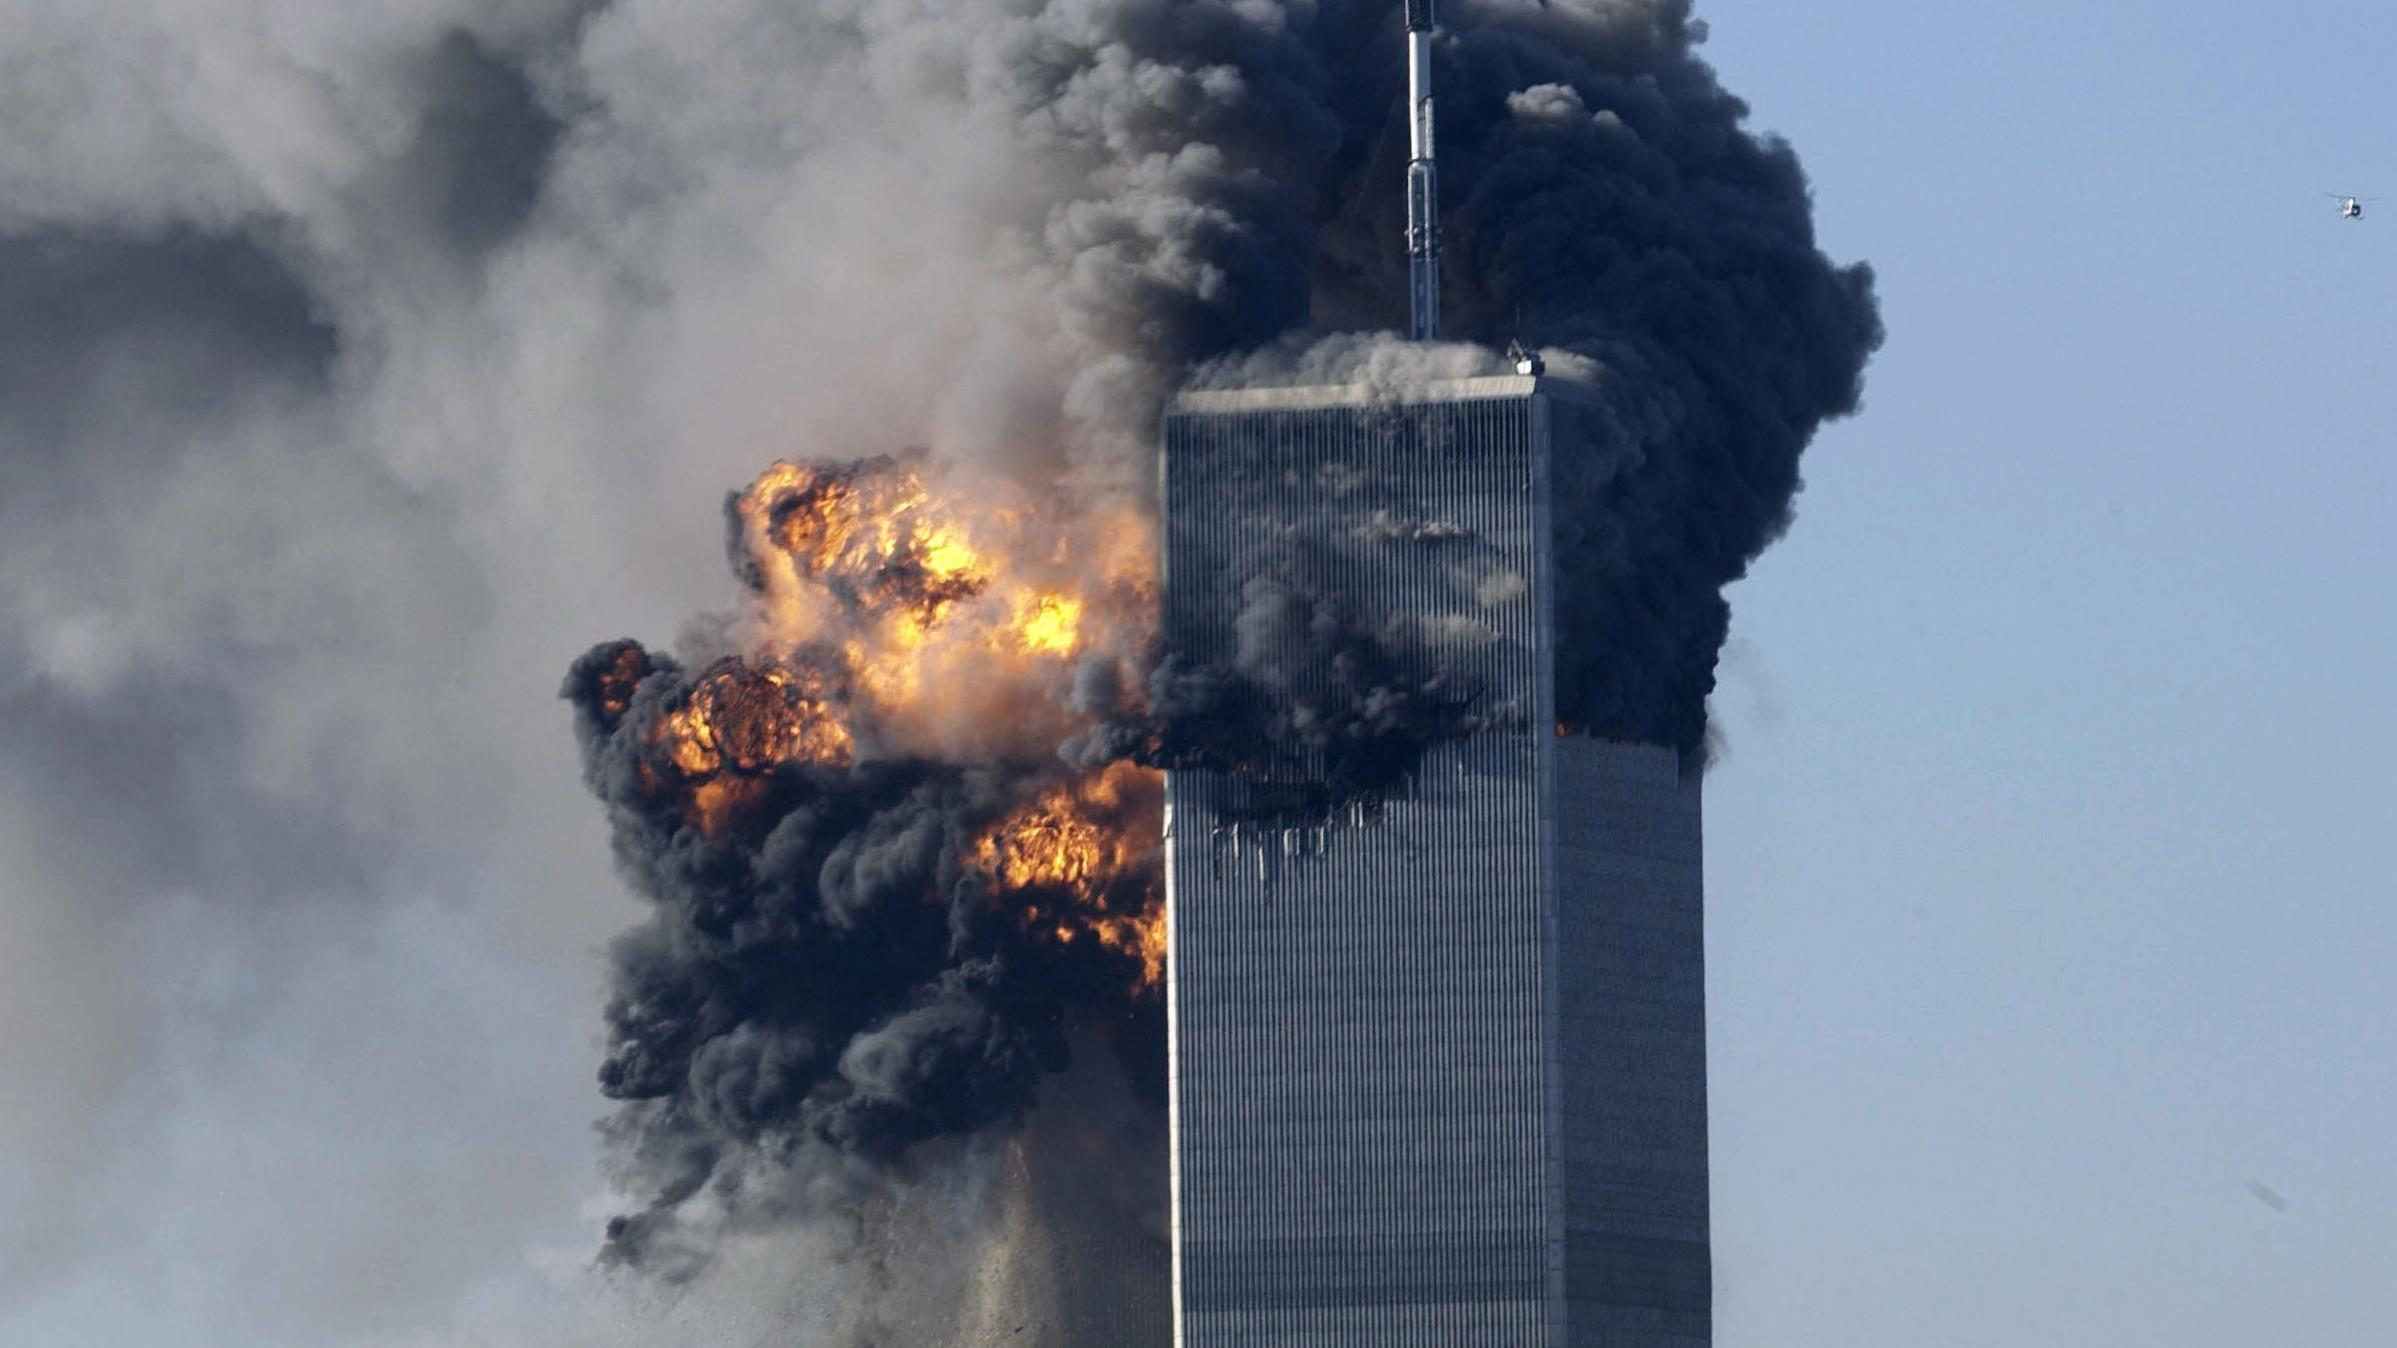 11 września. Atak na WTC. Rocznica ataku na World Trade Center